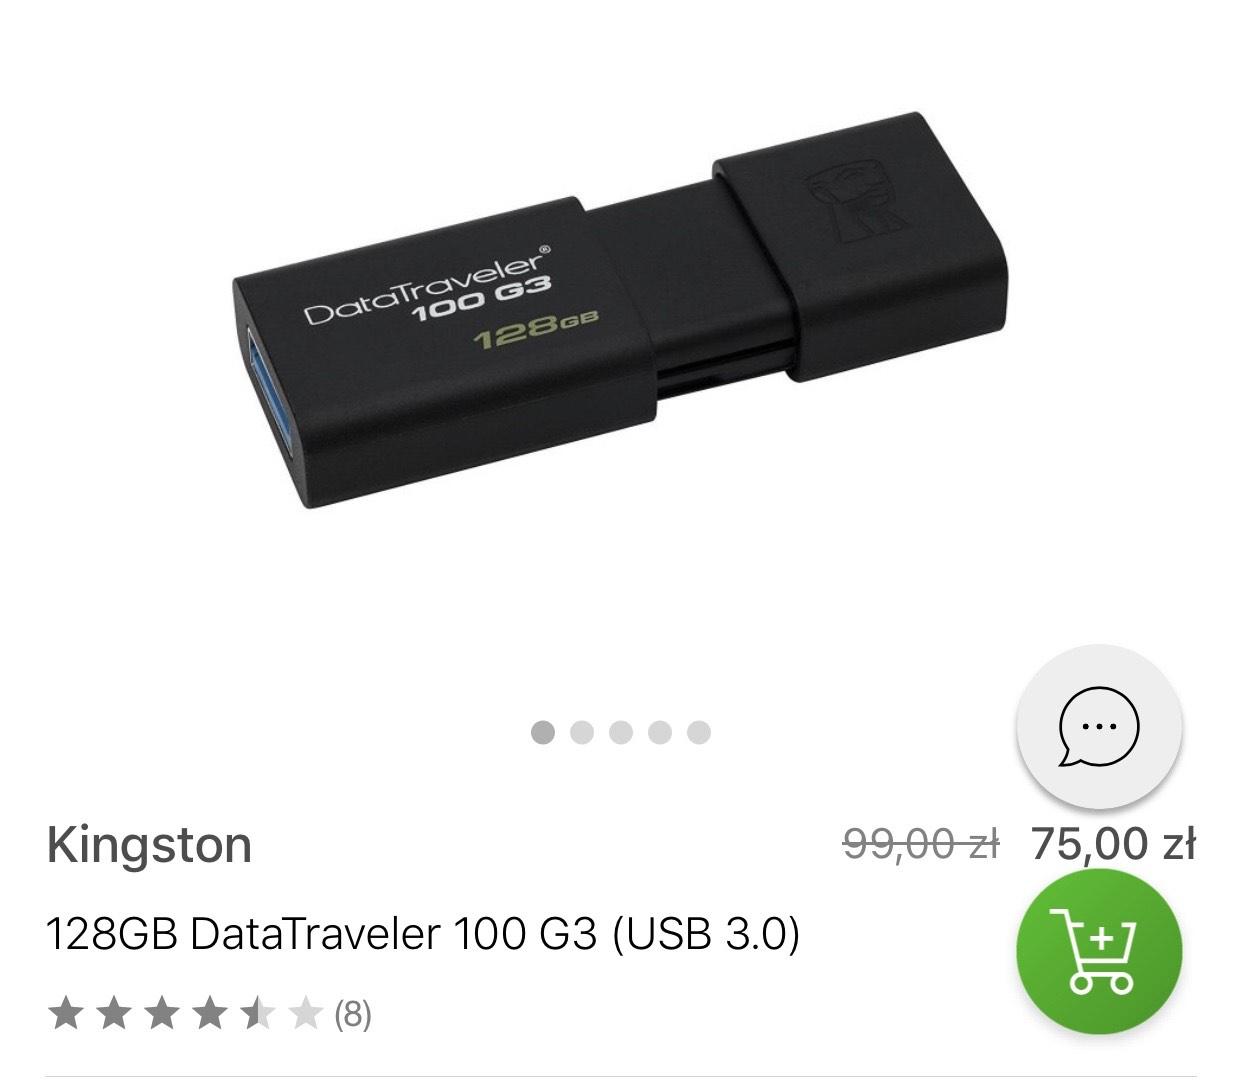 Kingston 128GB DataTraveler 100 G3 (USB 3.0) - Pendrive